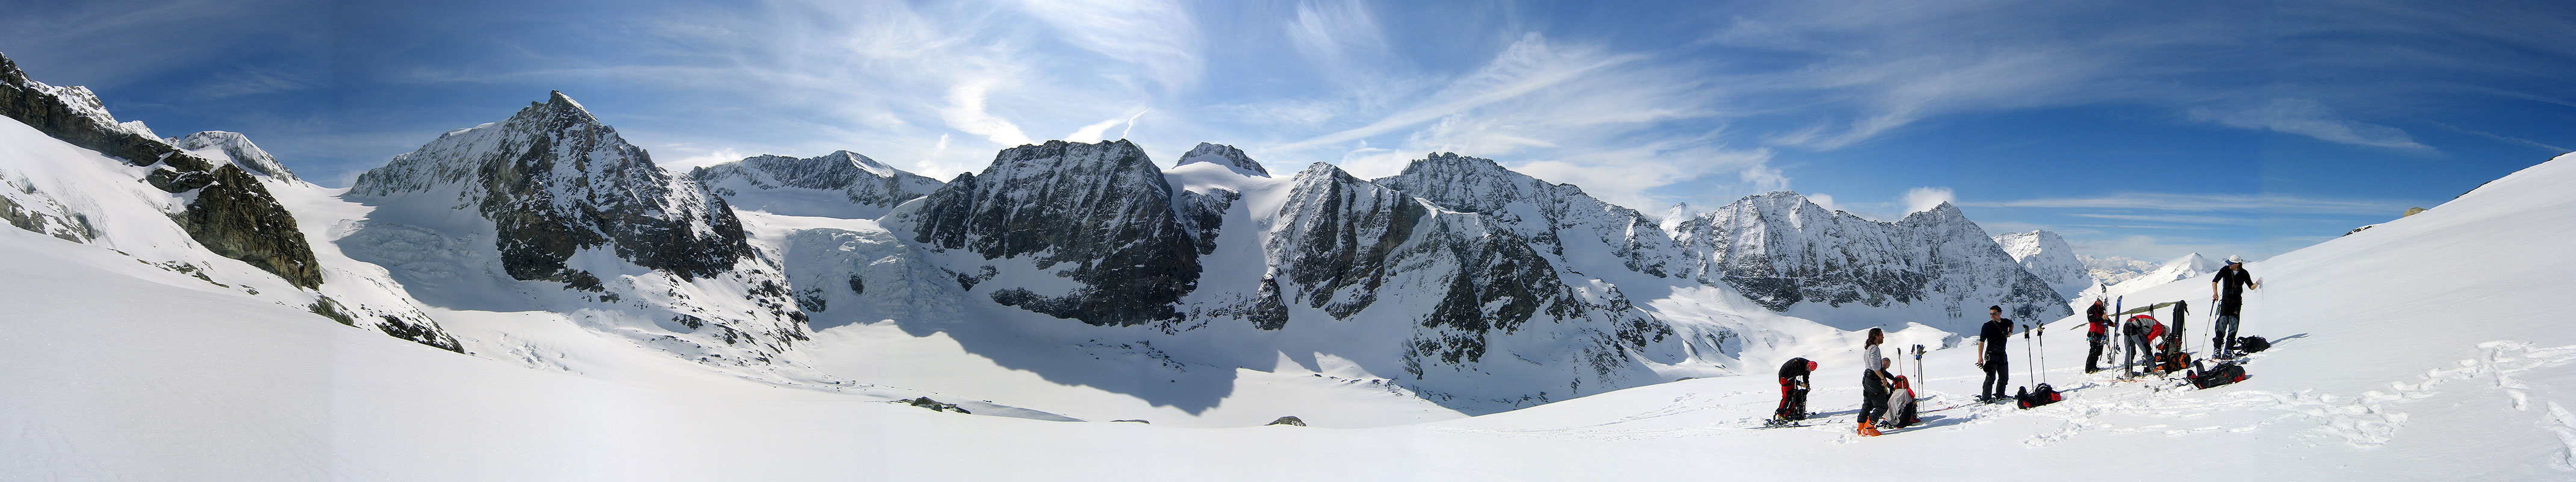 La Ruinette Walliser Alpen / Alpes valaisannes Švýcarsko panorama 25